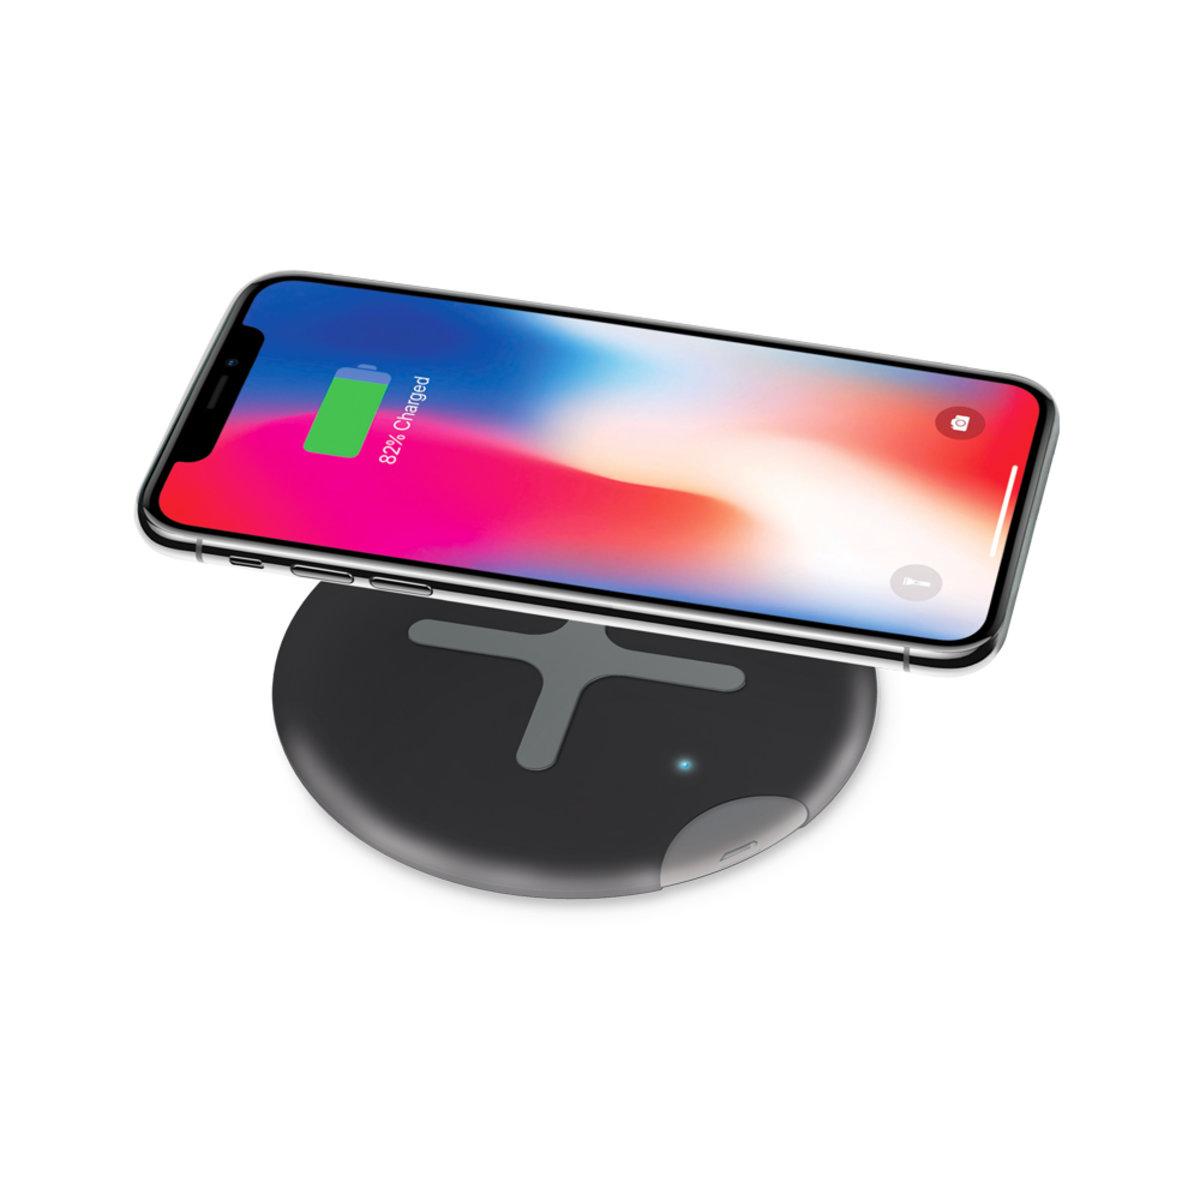 Model X Wireless Charging Pad